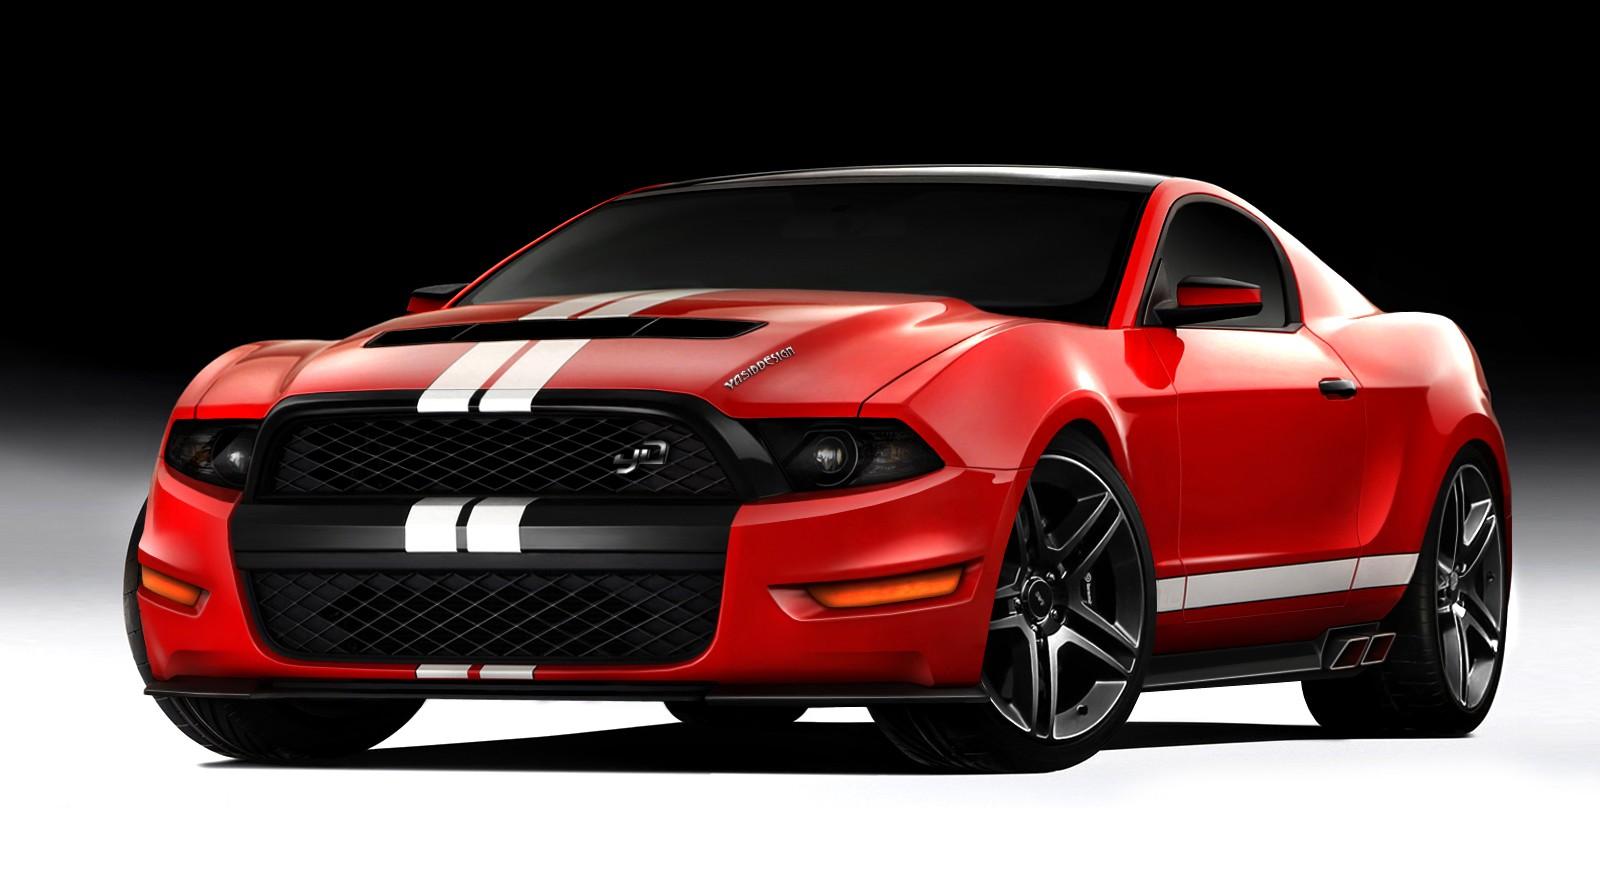 2014 Ford Mustang Gt Hd Wallpaper Mauserfan1910 Photo 40195530